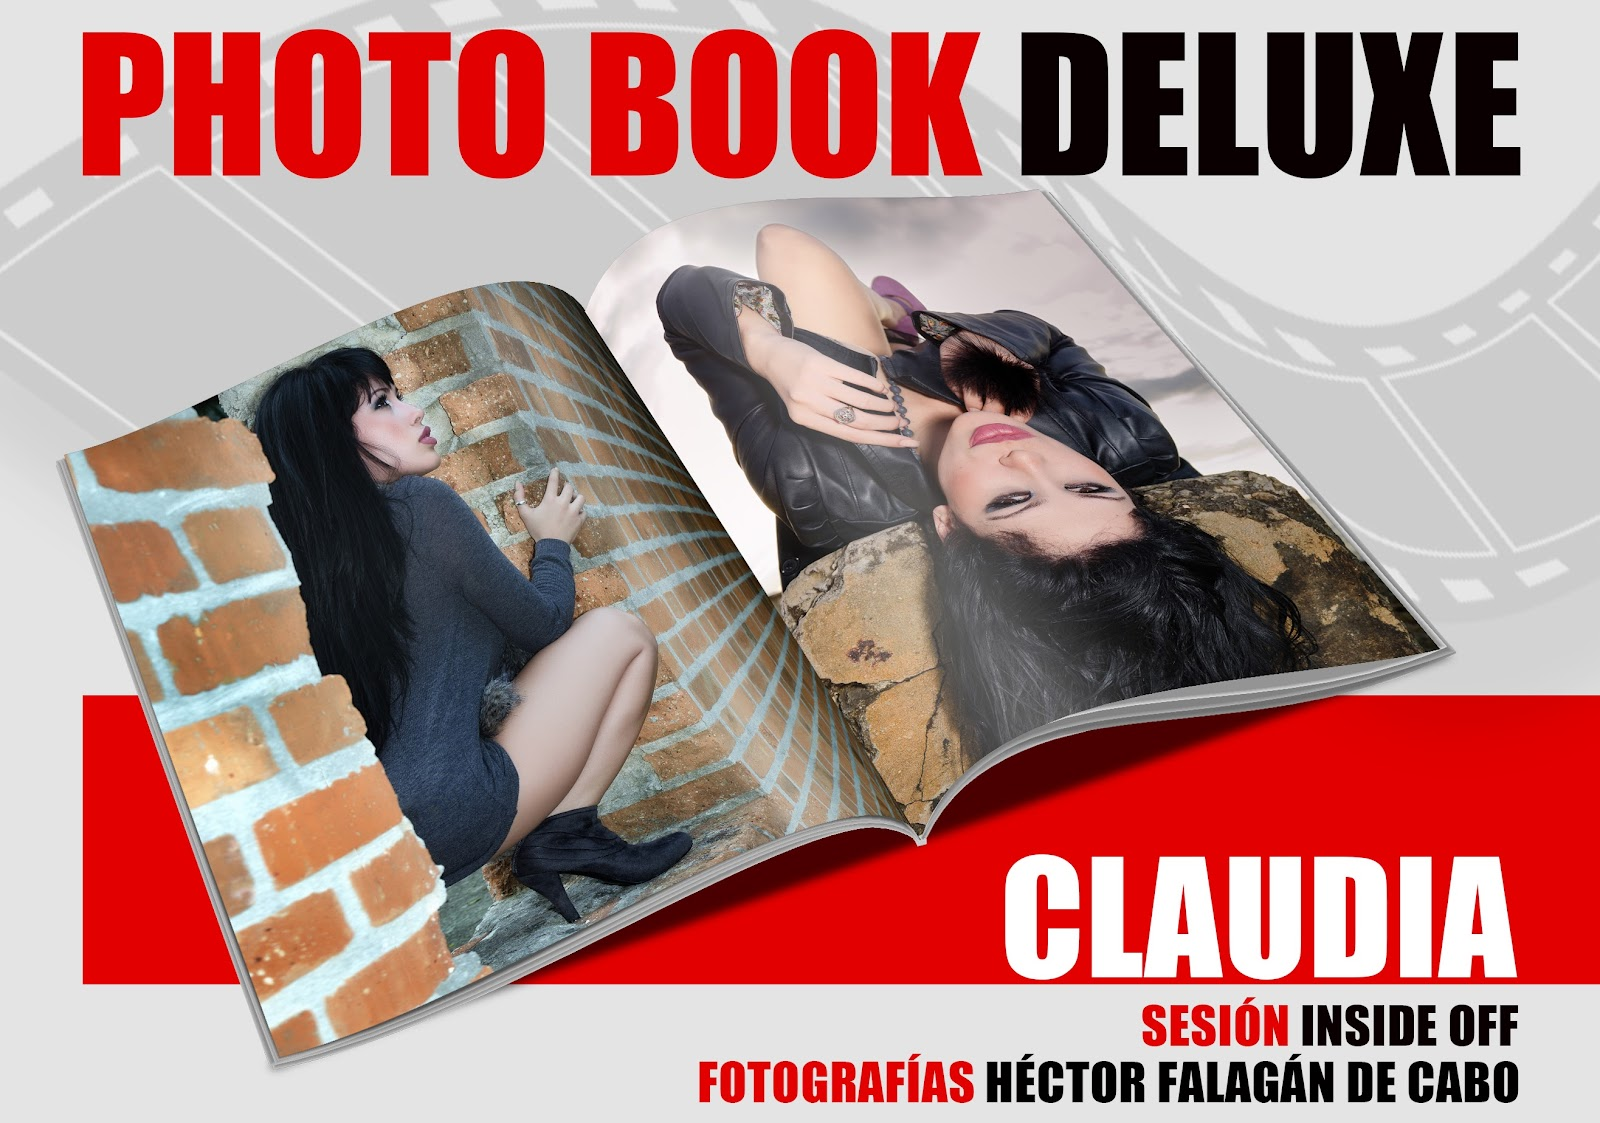 Fotografía Modelos Habana. Claudia: Inside Off. Héctor Falagán De Cabo | hfilms & photography. La Habana, Cuba.